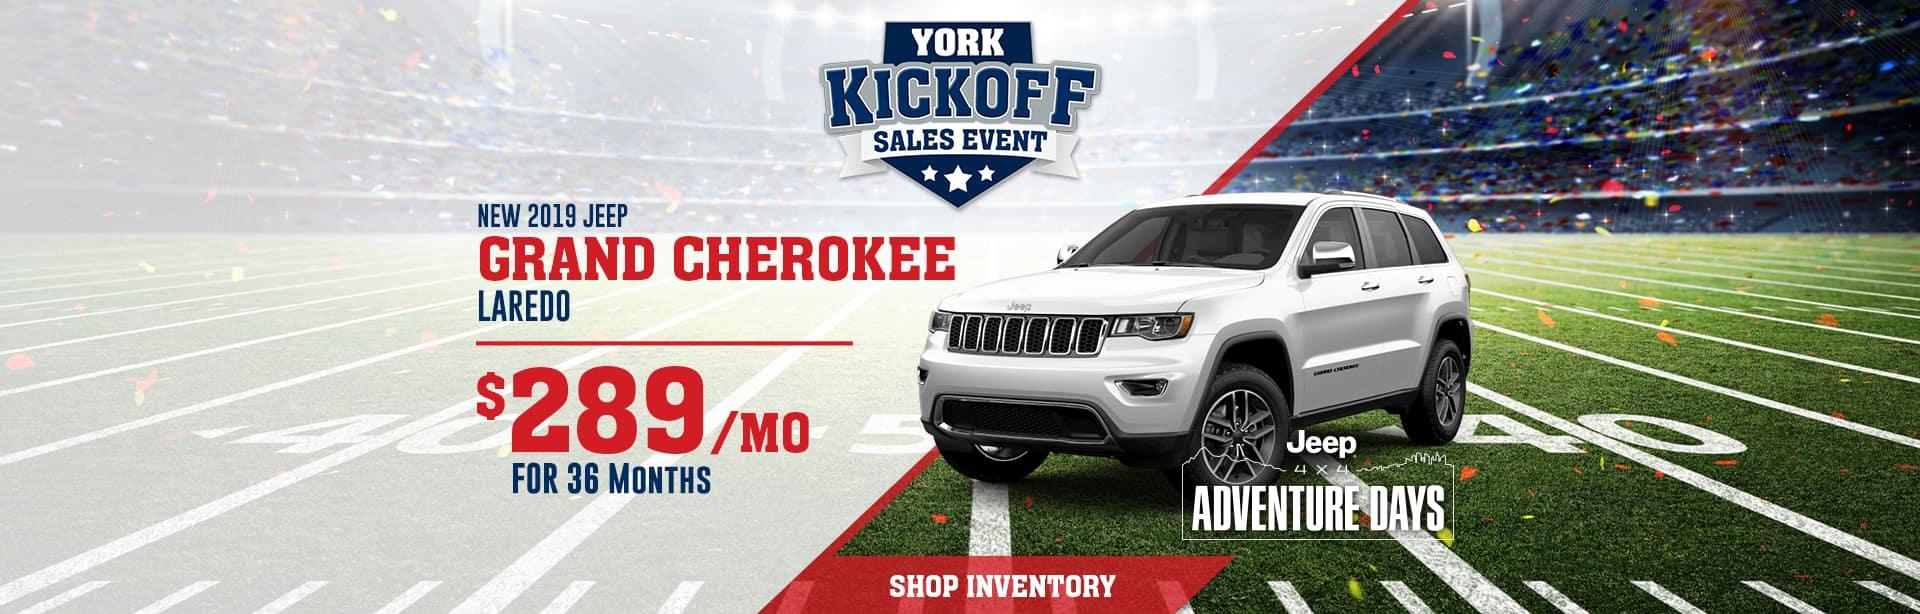 Lease a 2019 Jeep Grand Cherokee near Lafayette, Indiana